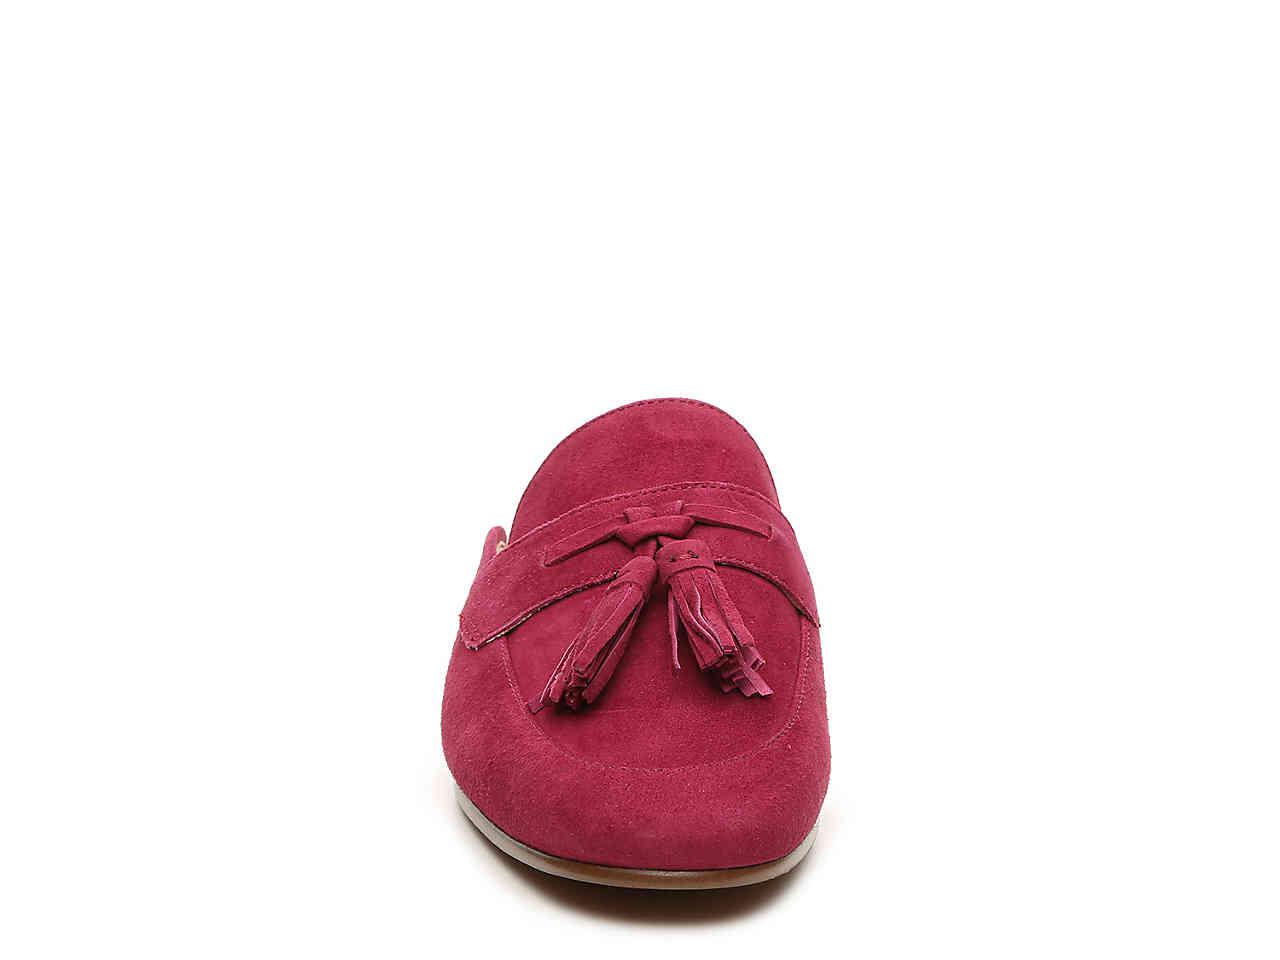 92de630ef Lyst - Sam Edelman Paris Mule in Red